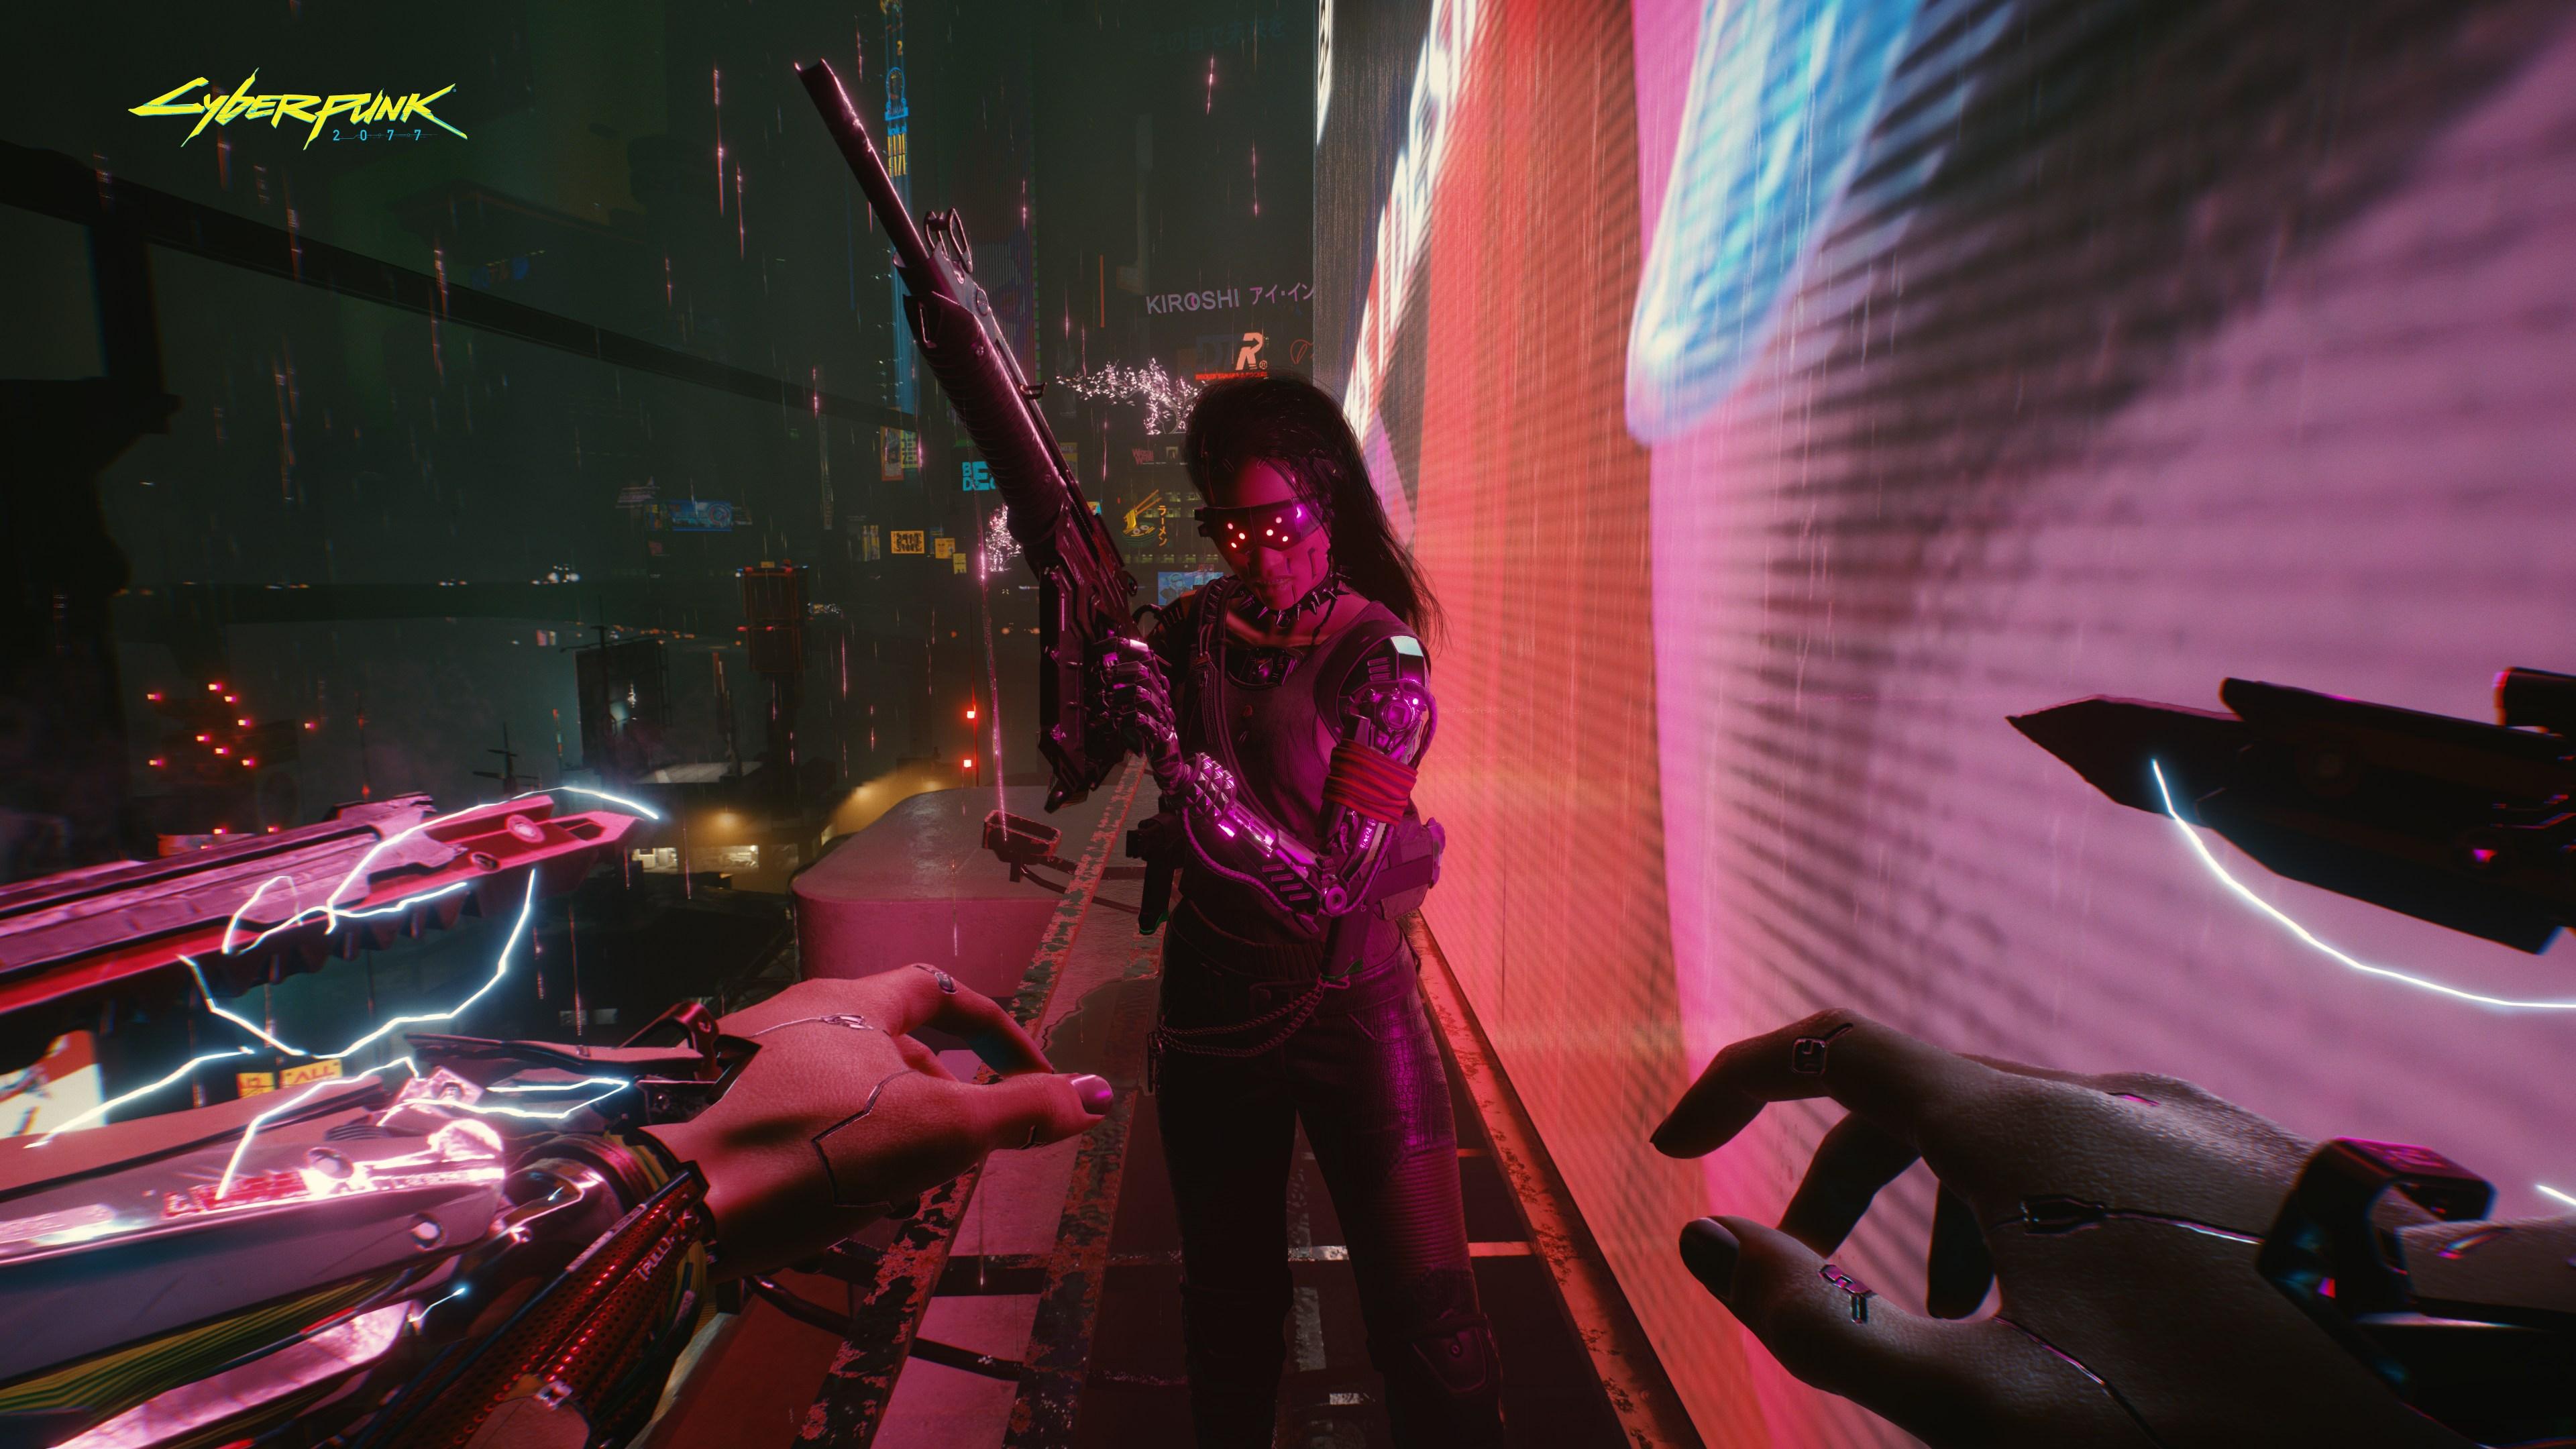 cyberpunk 2077 trailer dublado